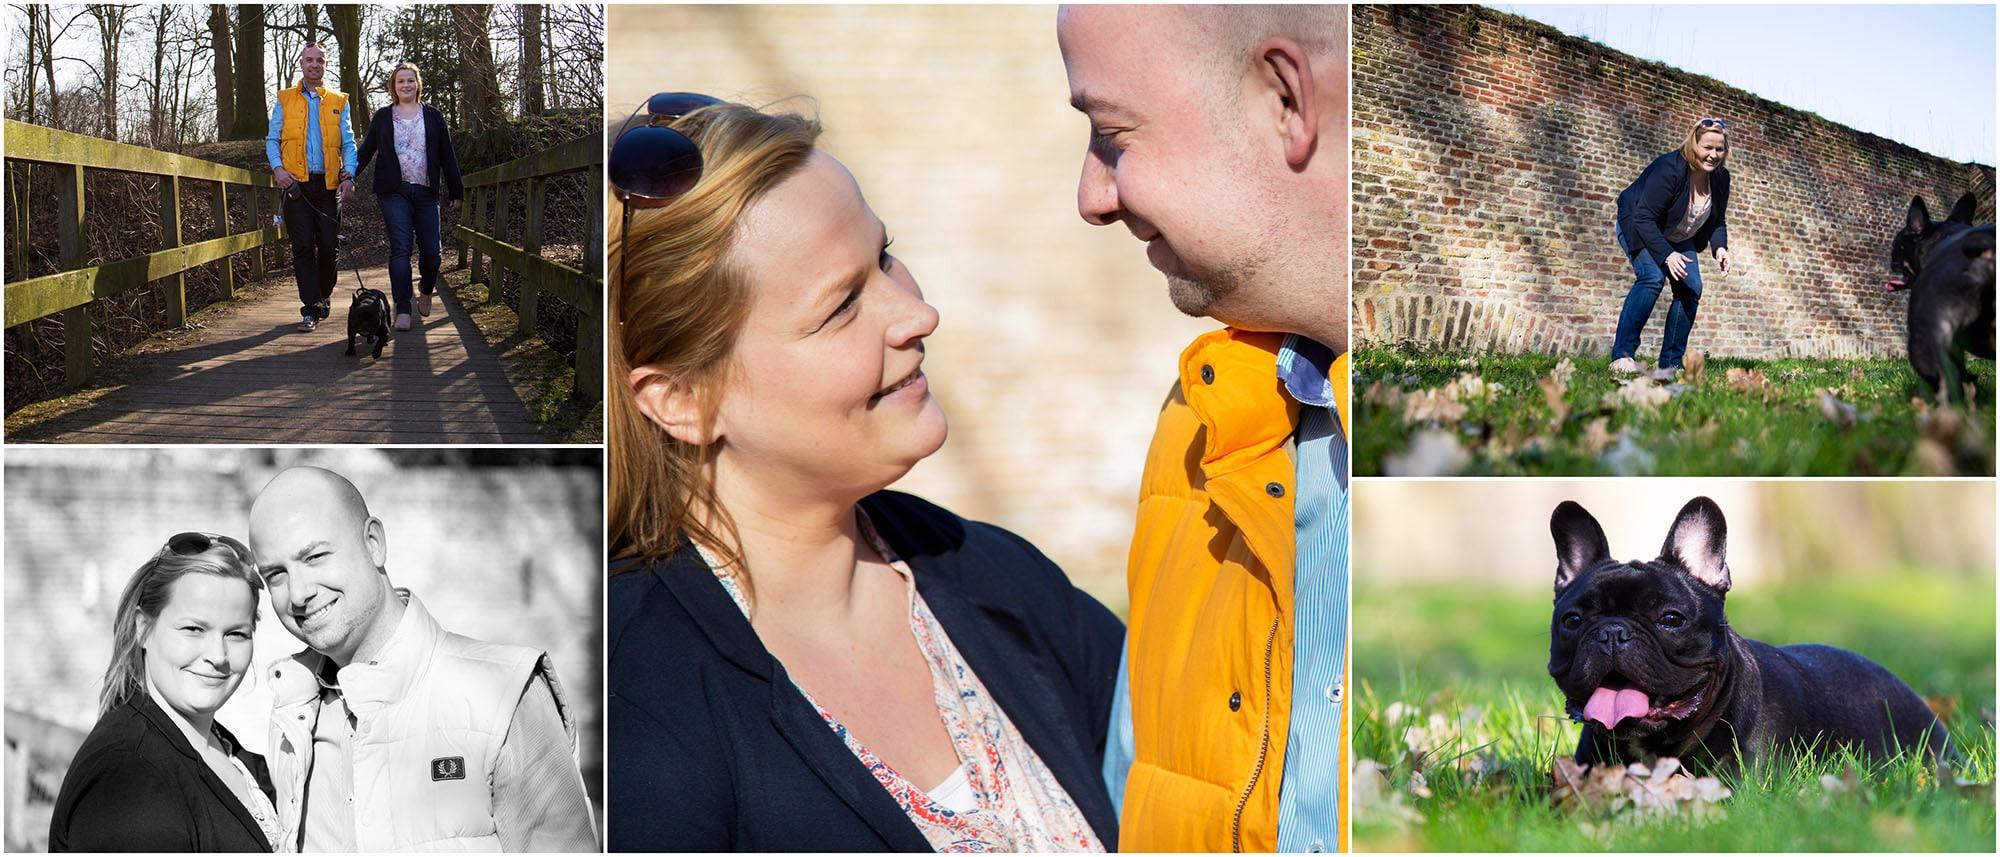 loveshoot bruiloft denbosch-zaltbommel